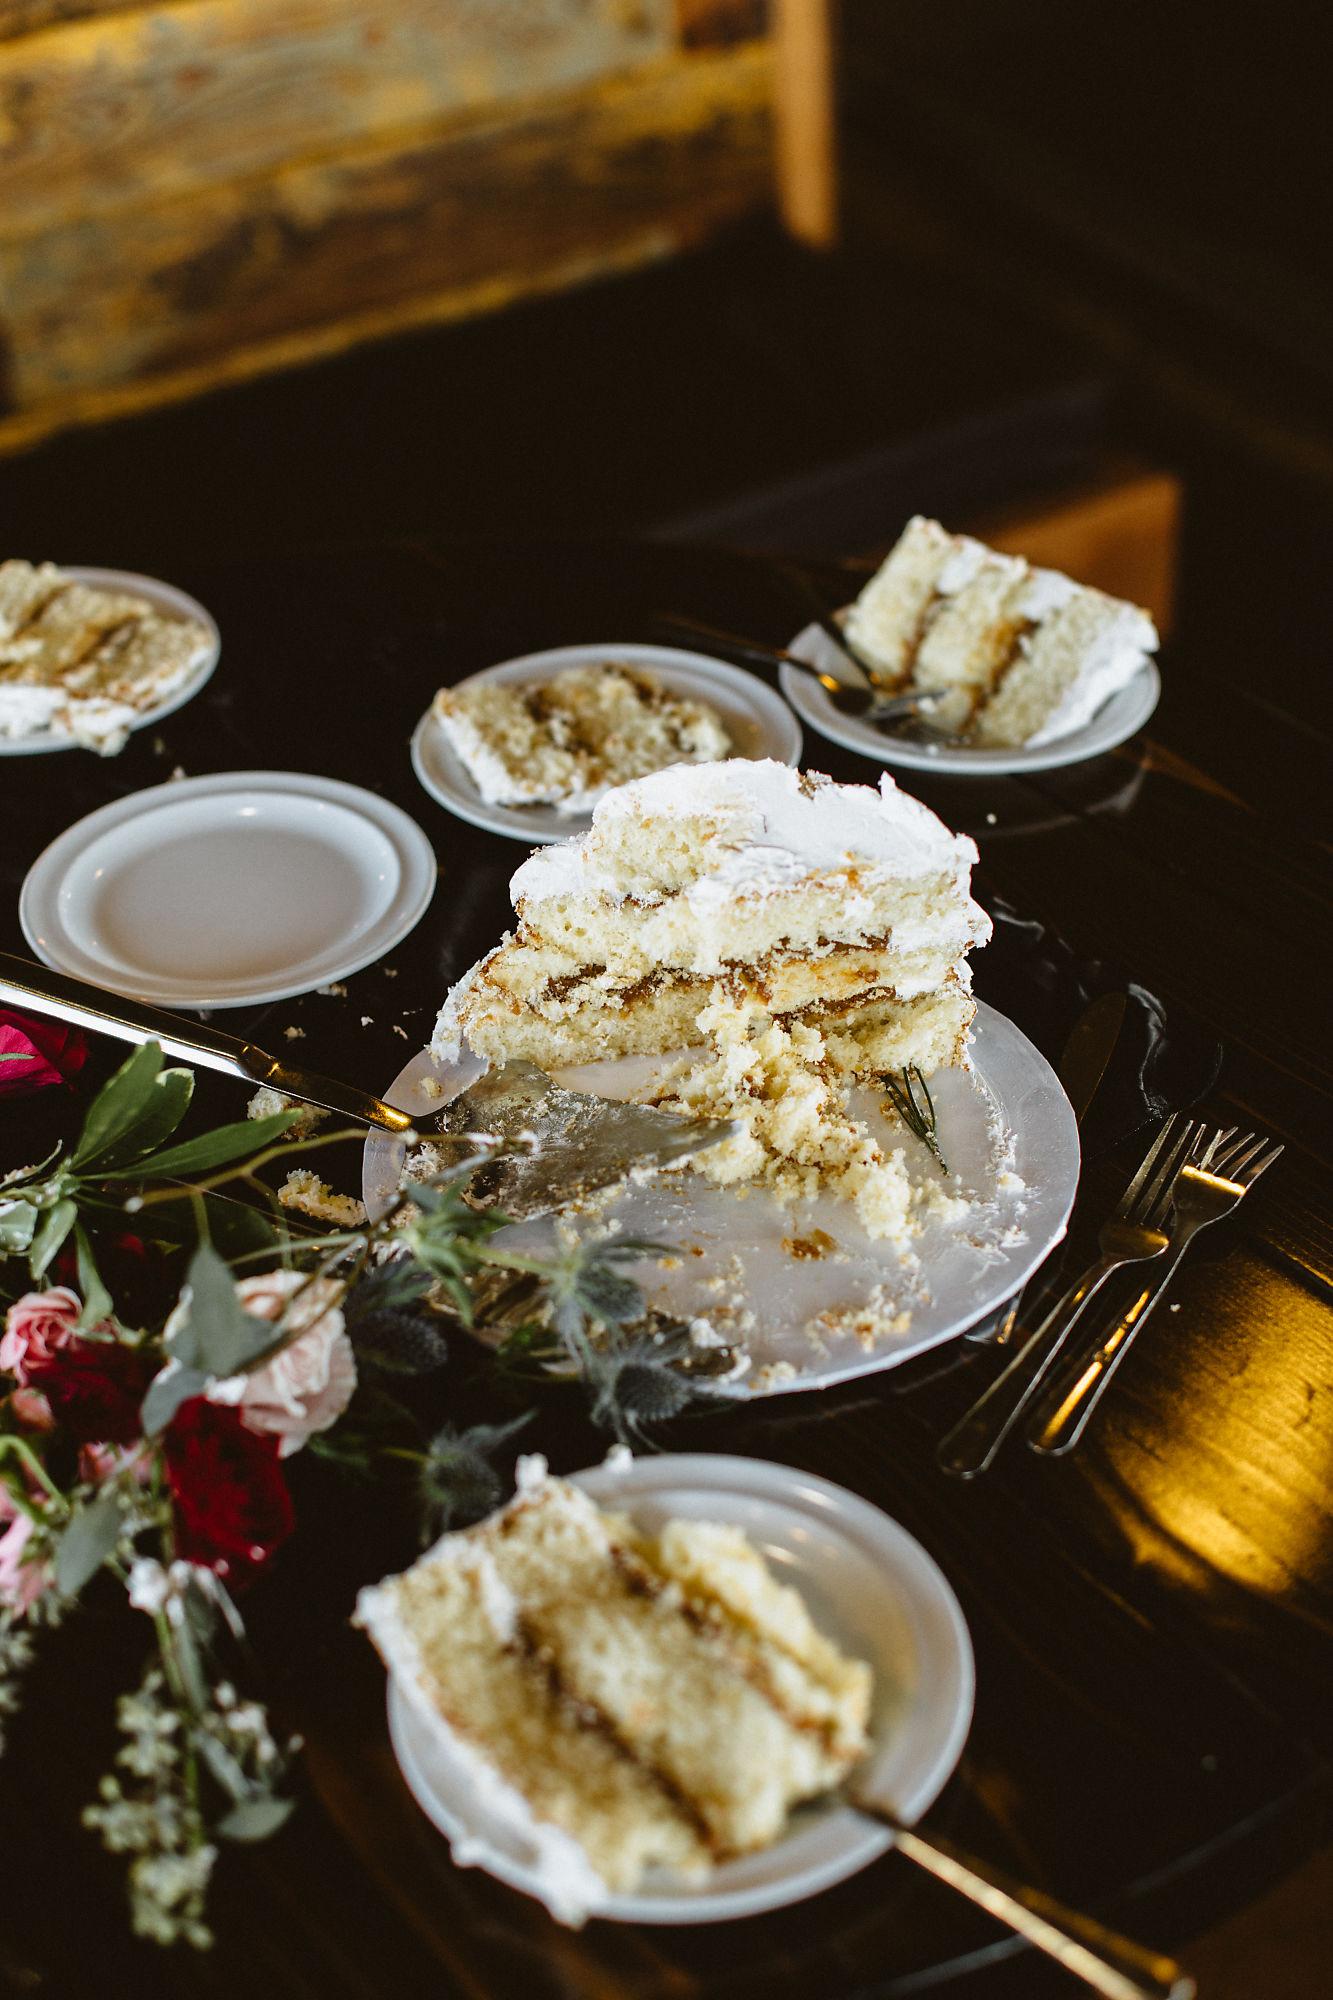 jessica_austin_oasis_brewery_wedding_photos155805.jpg